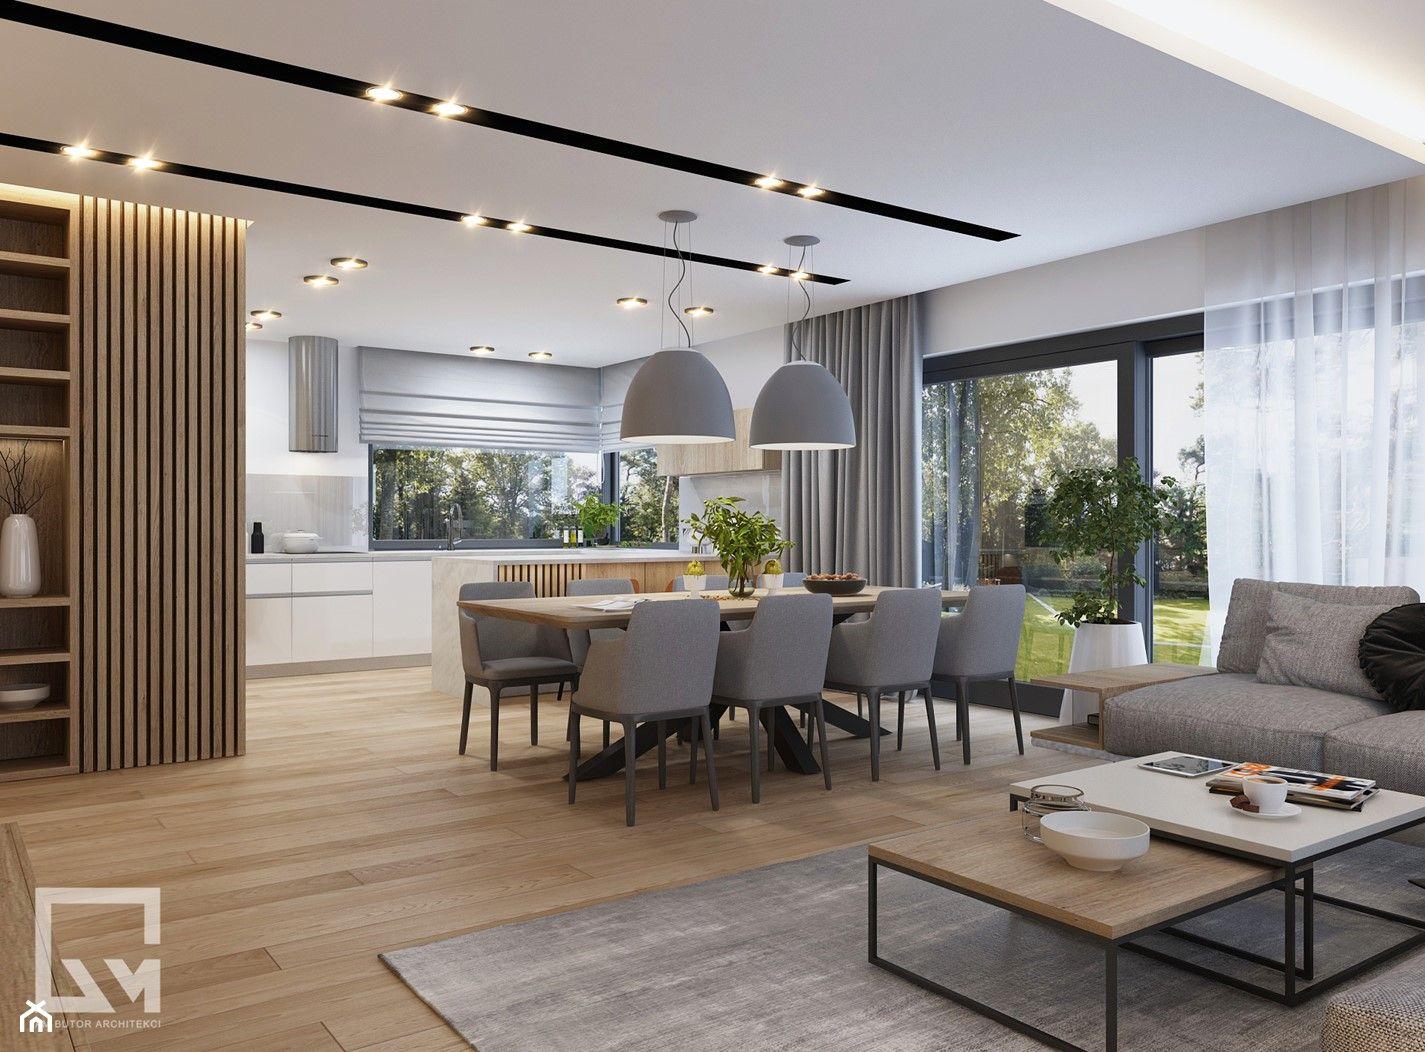 Kuchnia Styl Nowoczesny Luxury Living Room Decor Dining Room Design Modern Living Room Design Decor